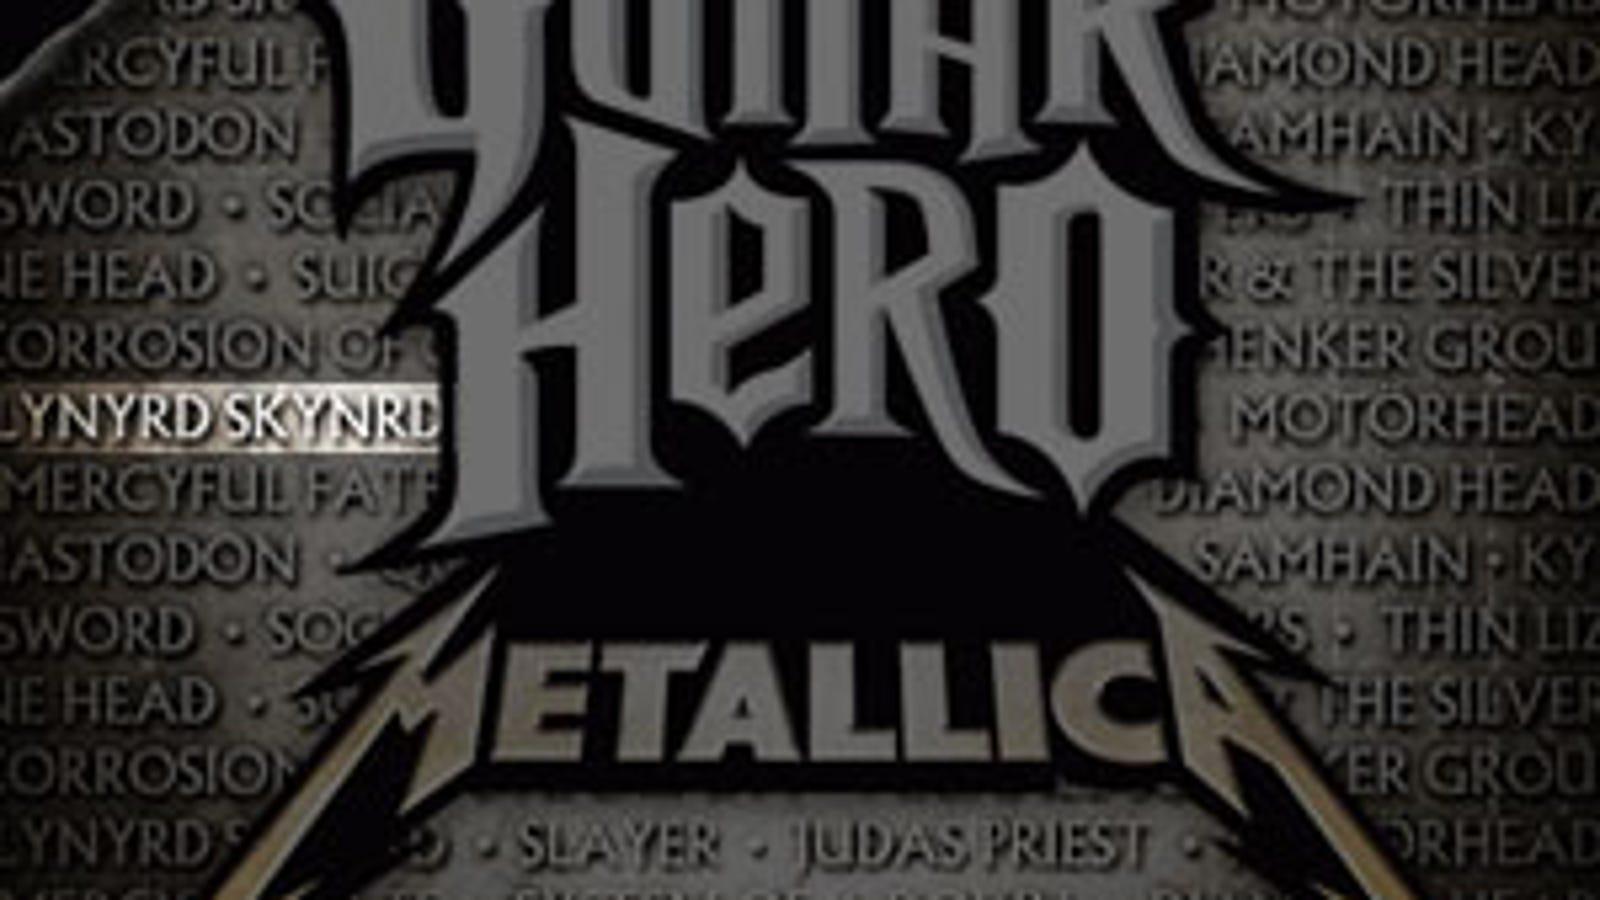 Guitar Hero: Metallica Misspells Band Name